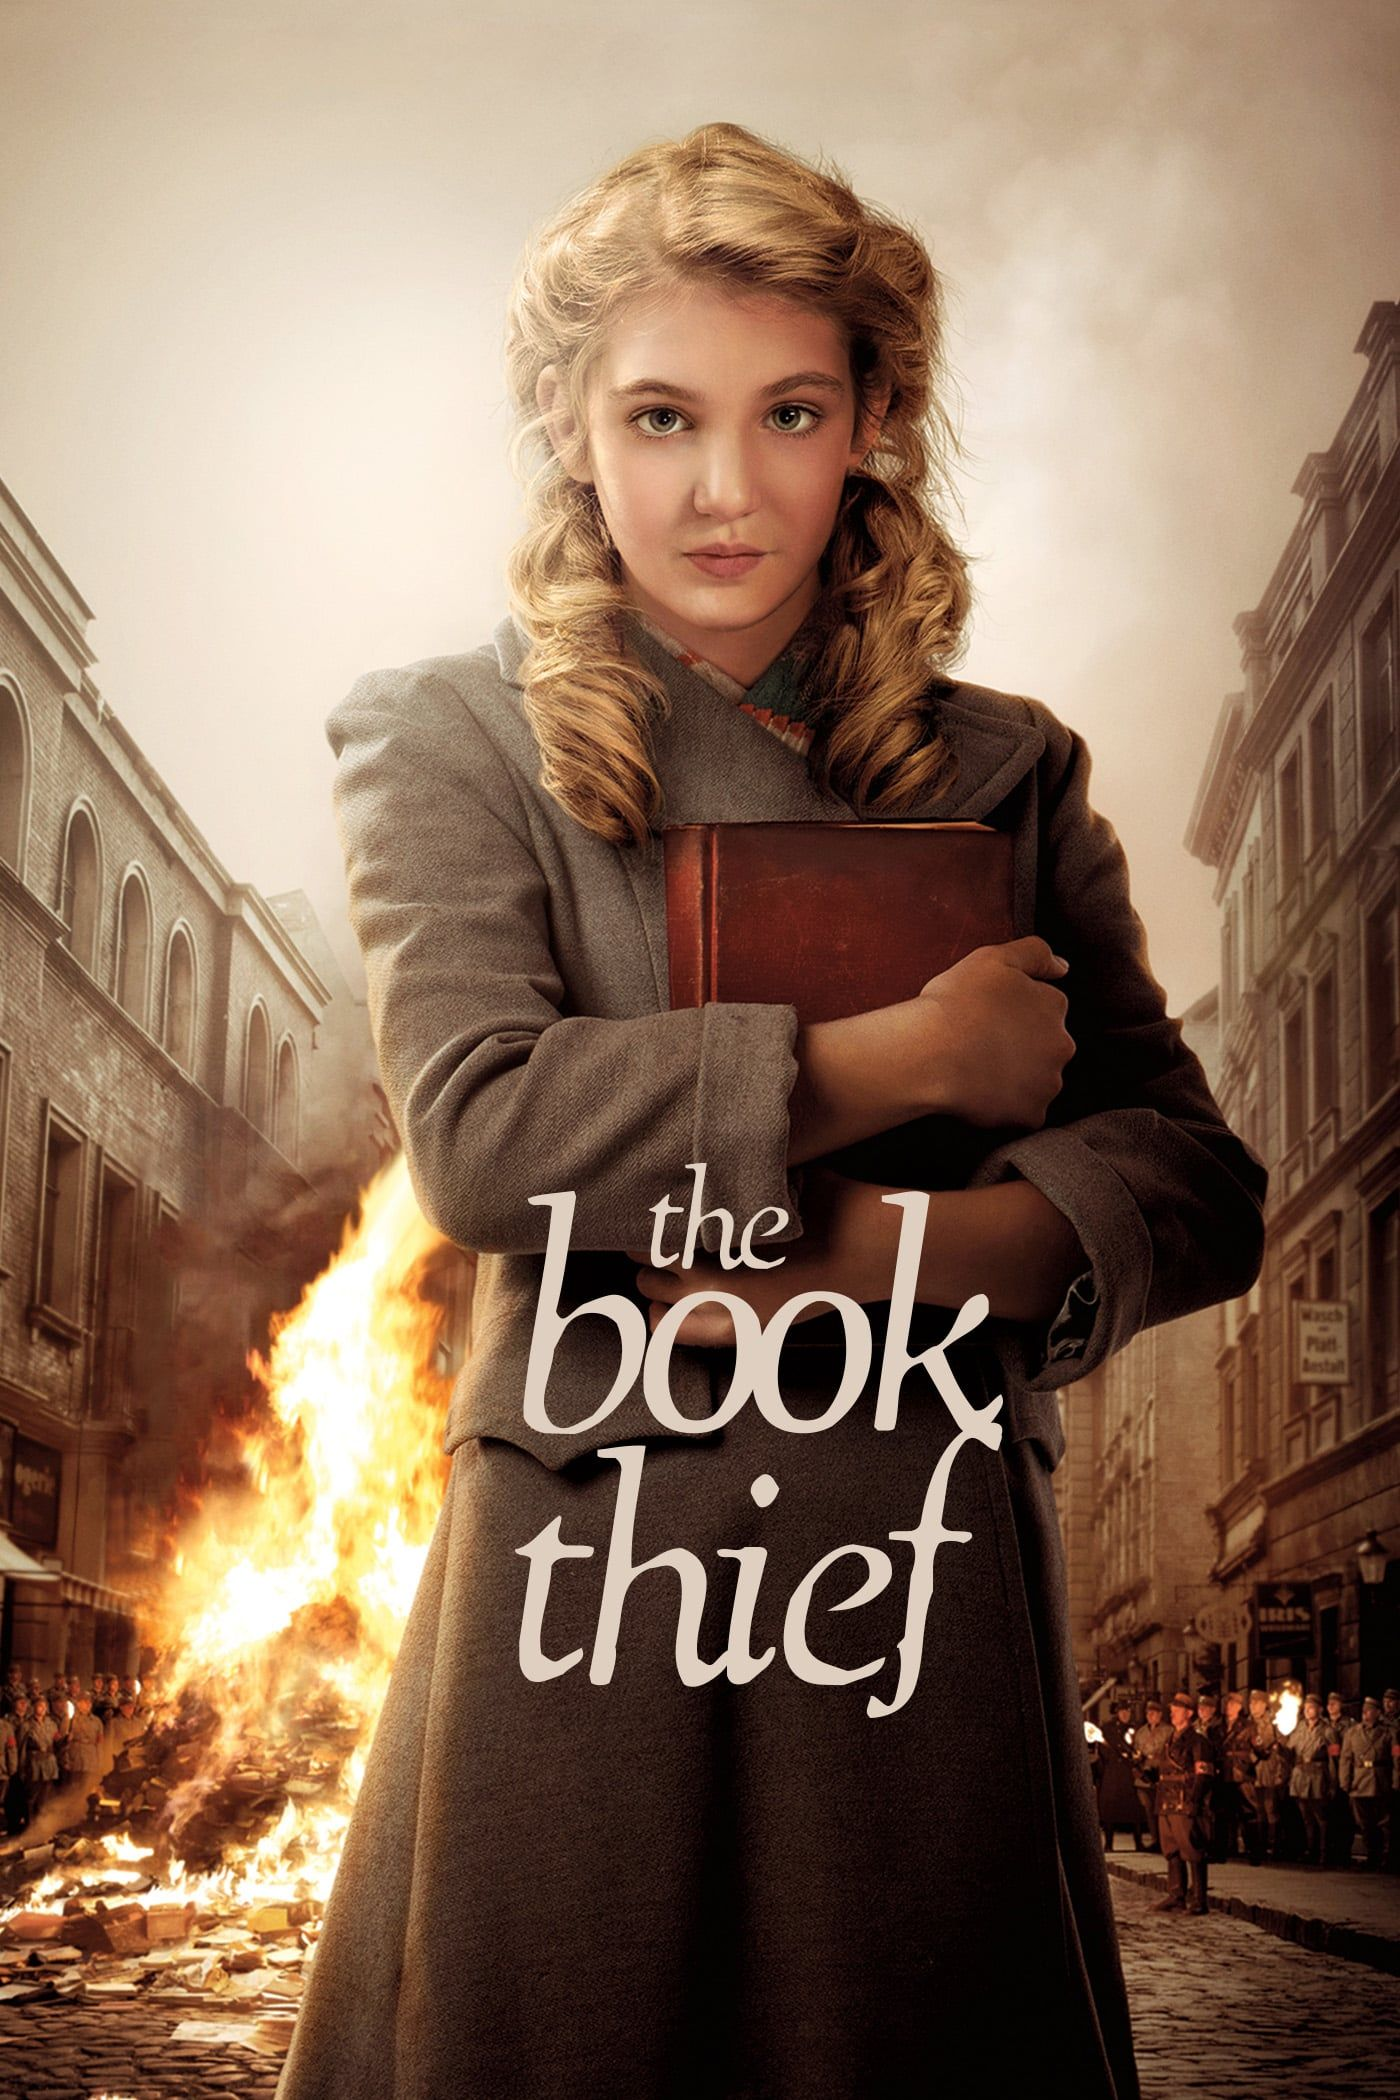 Best The Book Thief Movie Quotes Quote Catalog